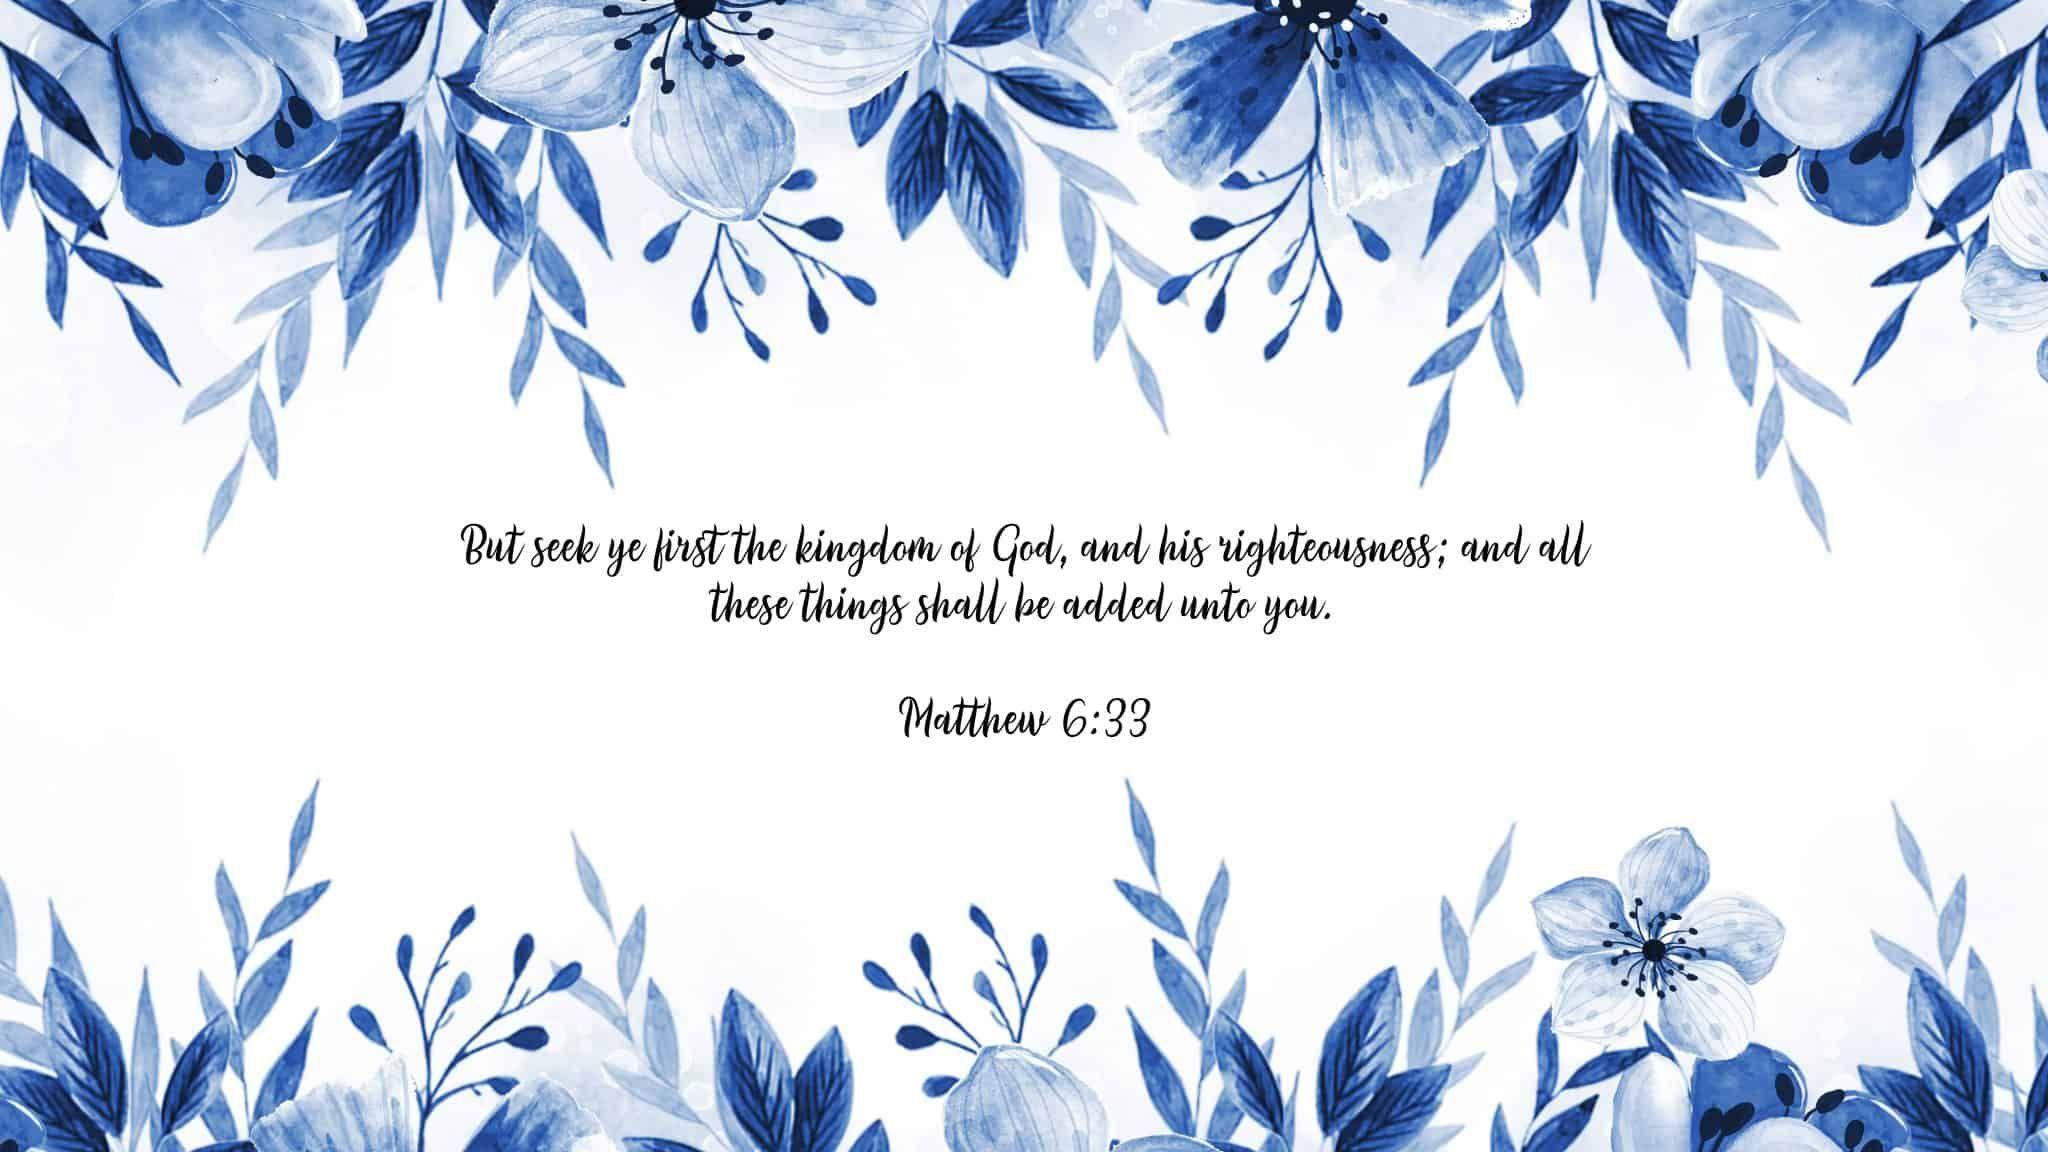 Matthew 6 33 Free Desktop Wallpaper My Printable Faith In 2021 Bible Verse Desktop Wallpaper Free Desktop Wallpaper Scripture Wallpaper